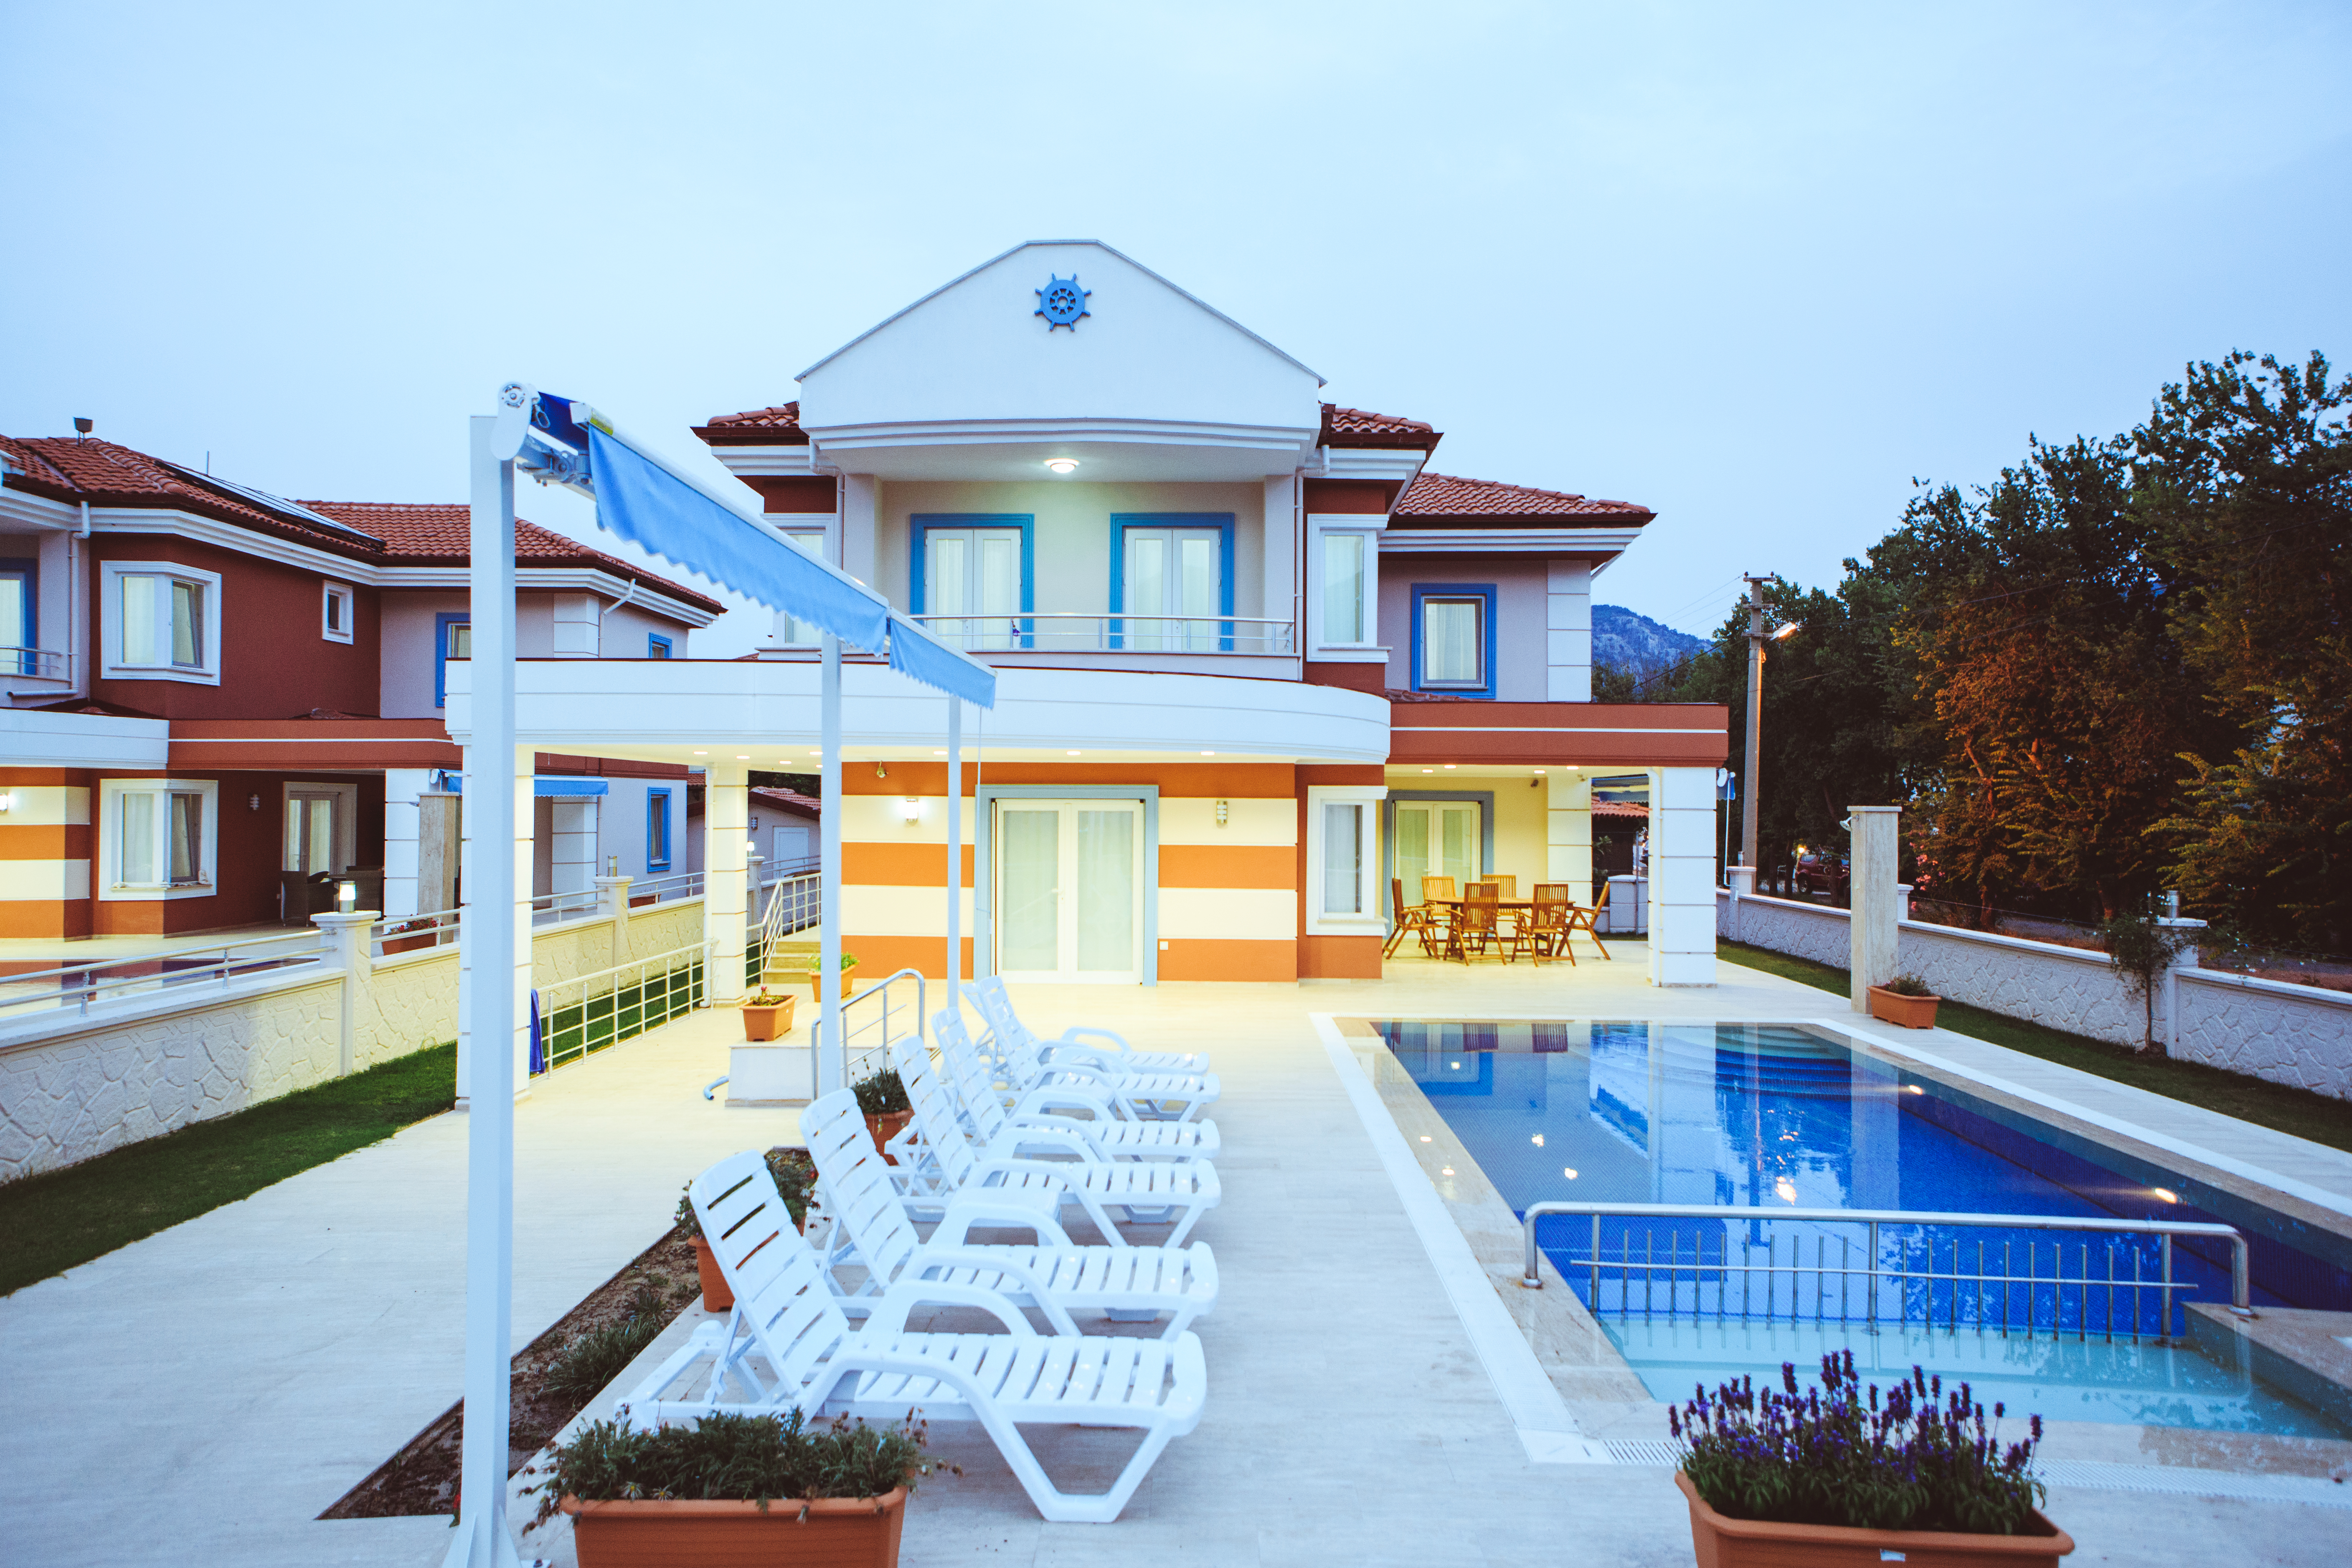 Rota Villa 1